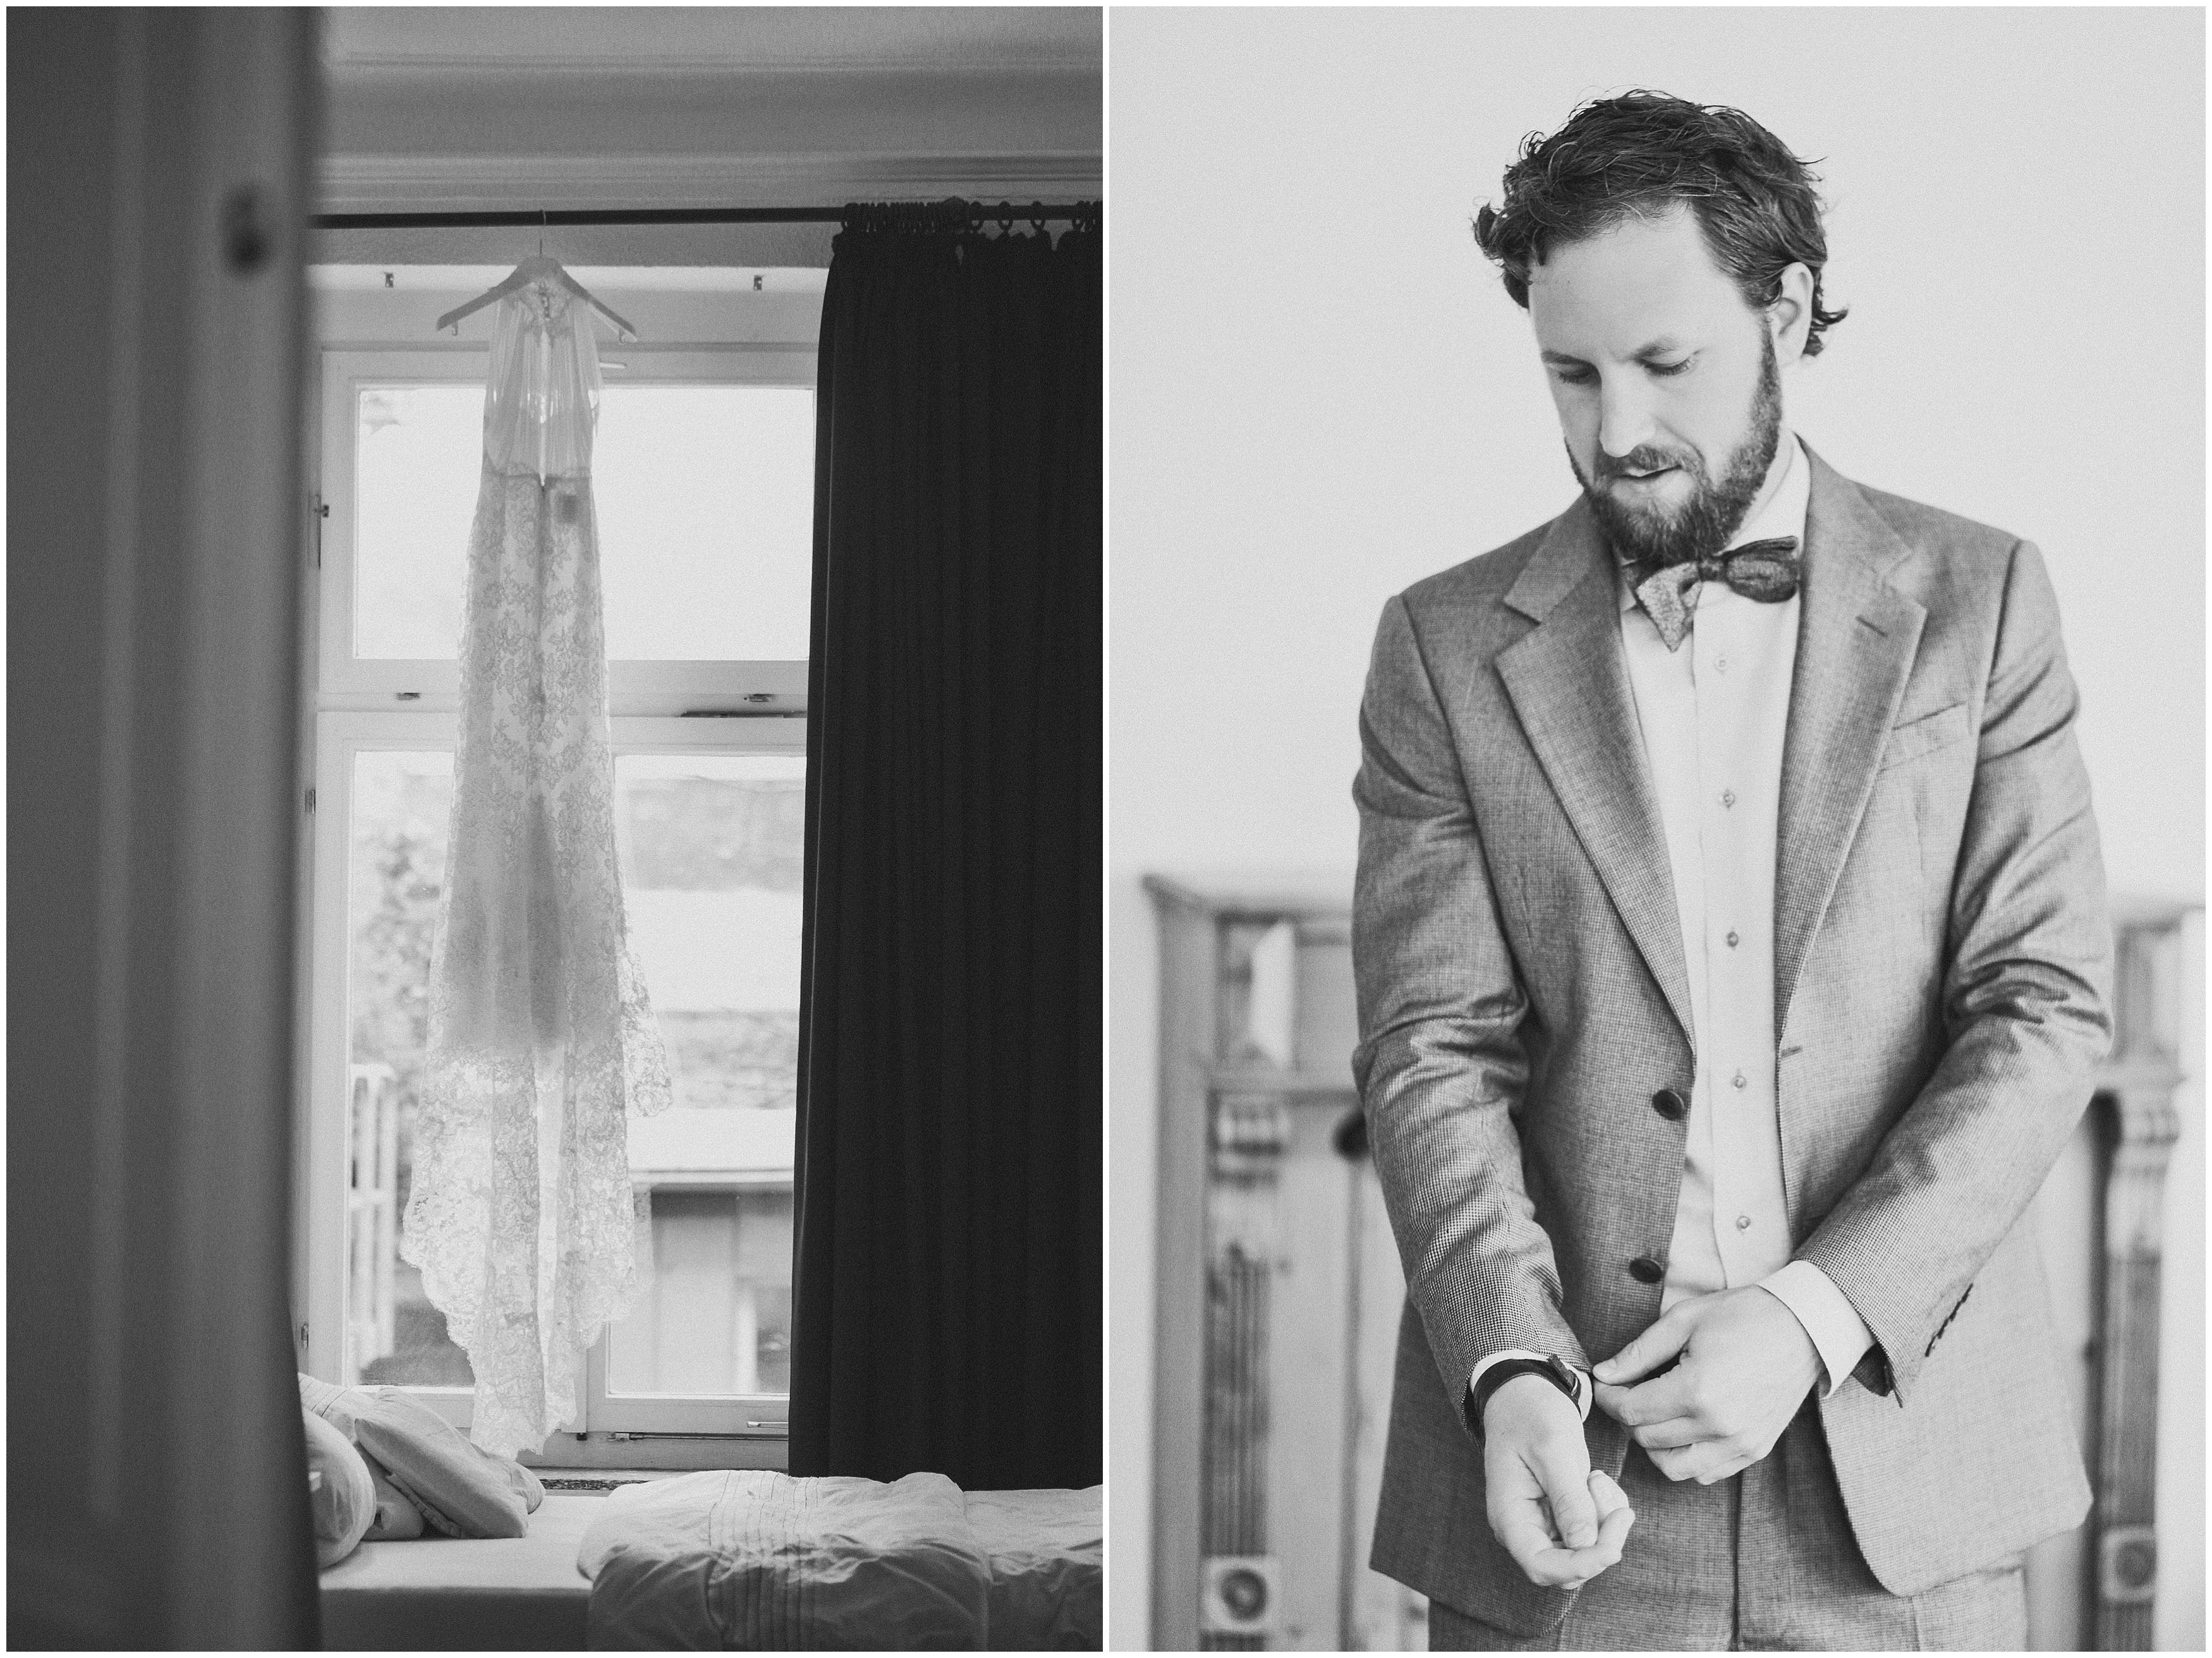 ivy&olive_Hochzeitsplanung_Nancy_Ebert_Fotografie_Vintage_Wedding_0009